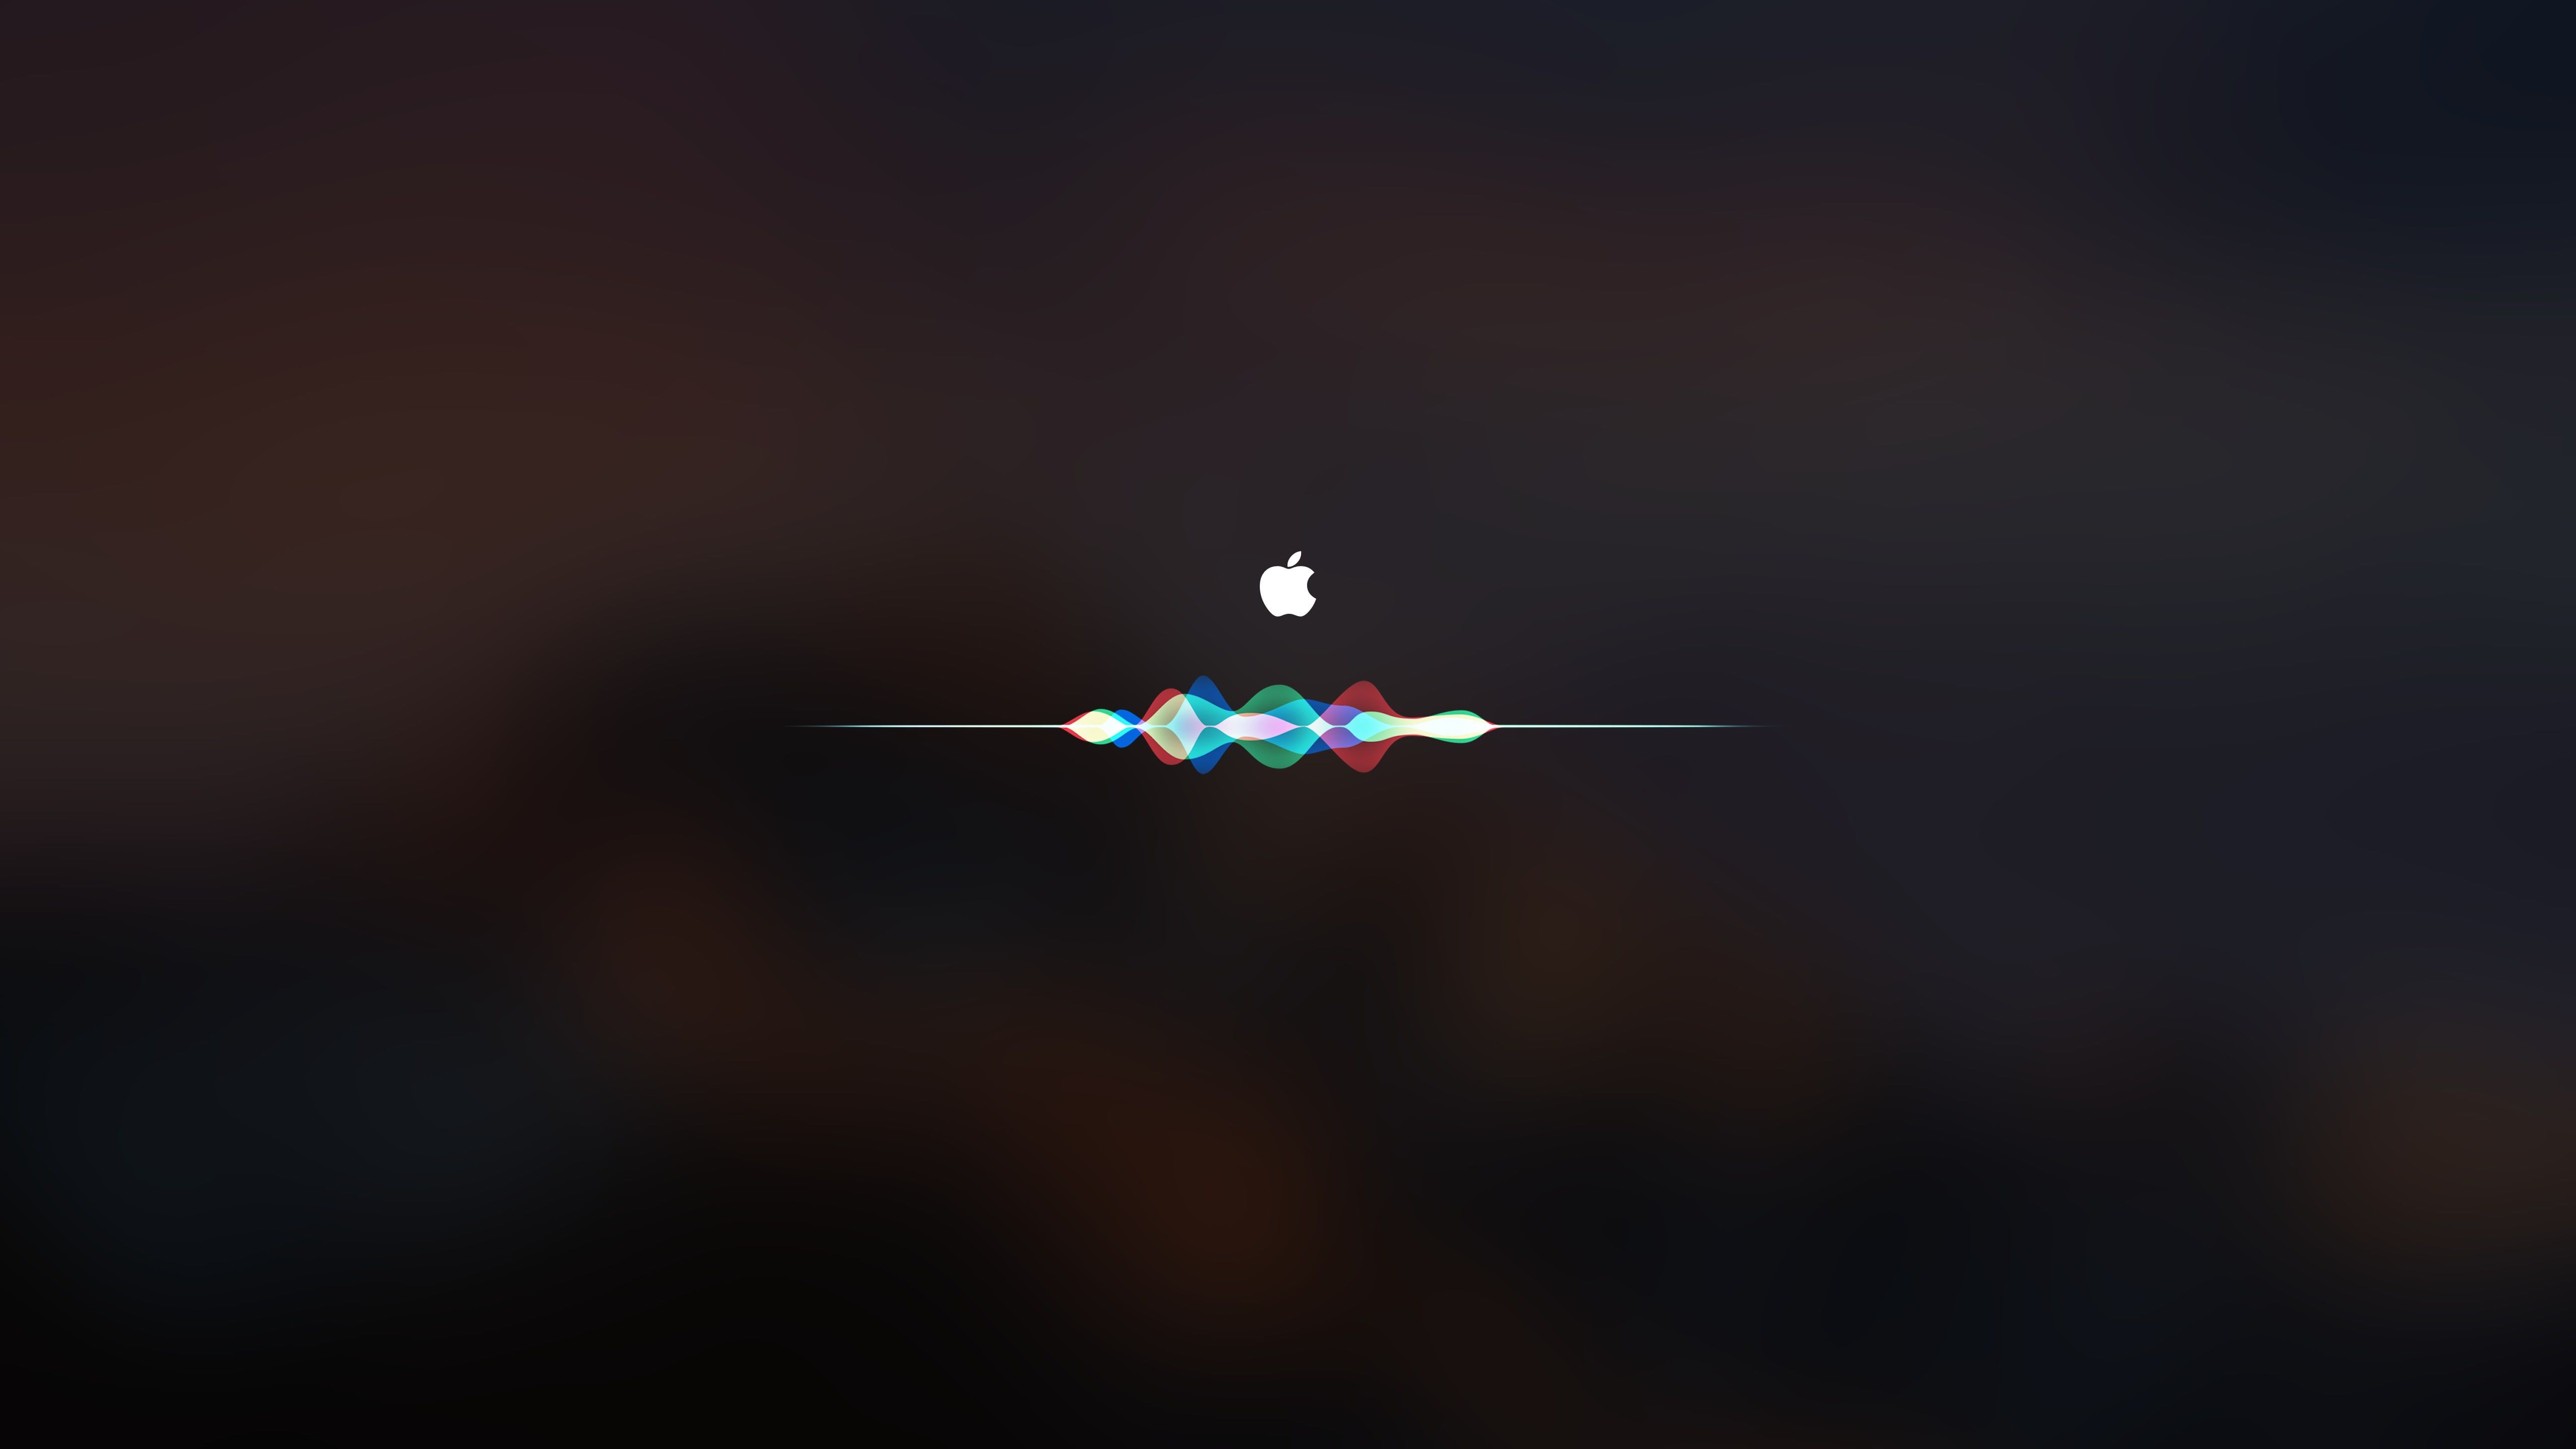 Apple Logo Dark Apple Mac Os X Siri 5k Wallpaper Hdwallpaper Desktop Apple Logo Wallpaper Airplane Wallpaper Iphone Wallpaper Video